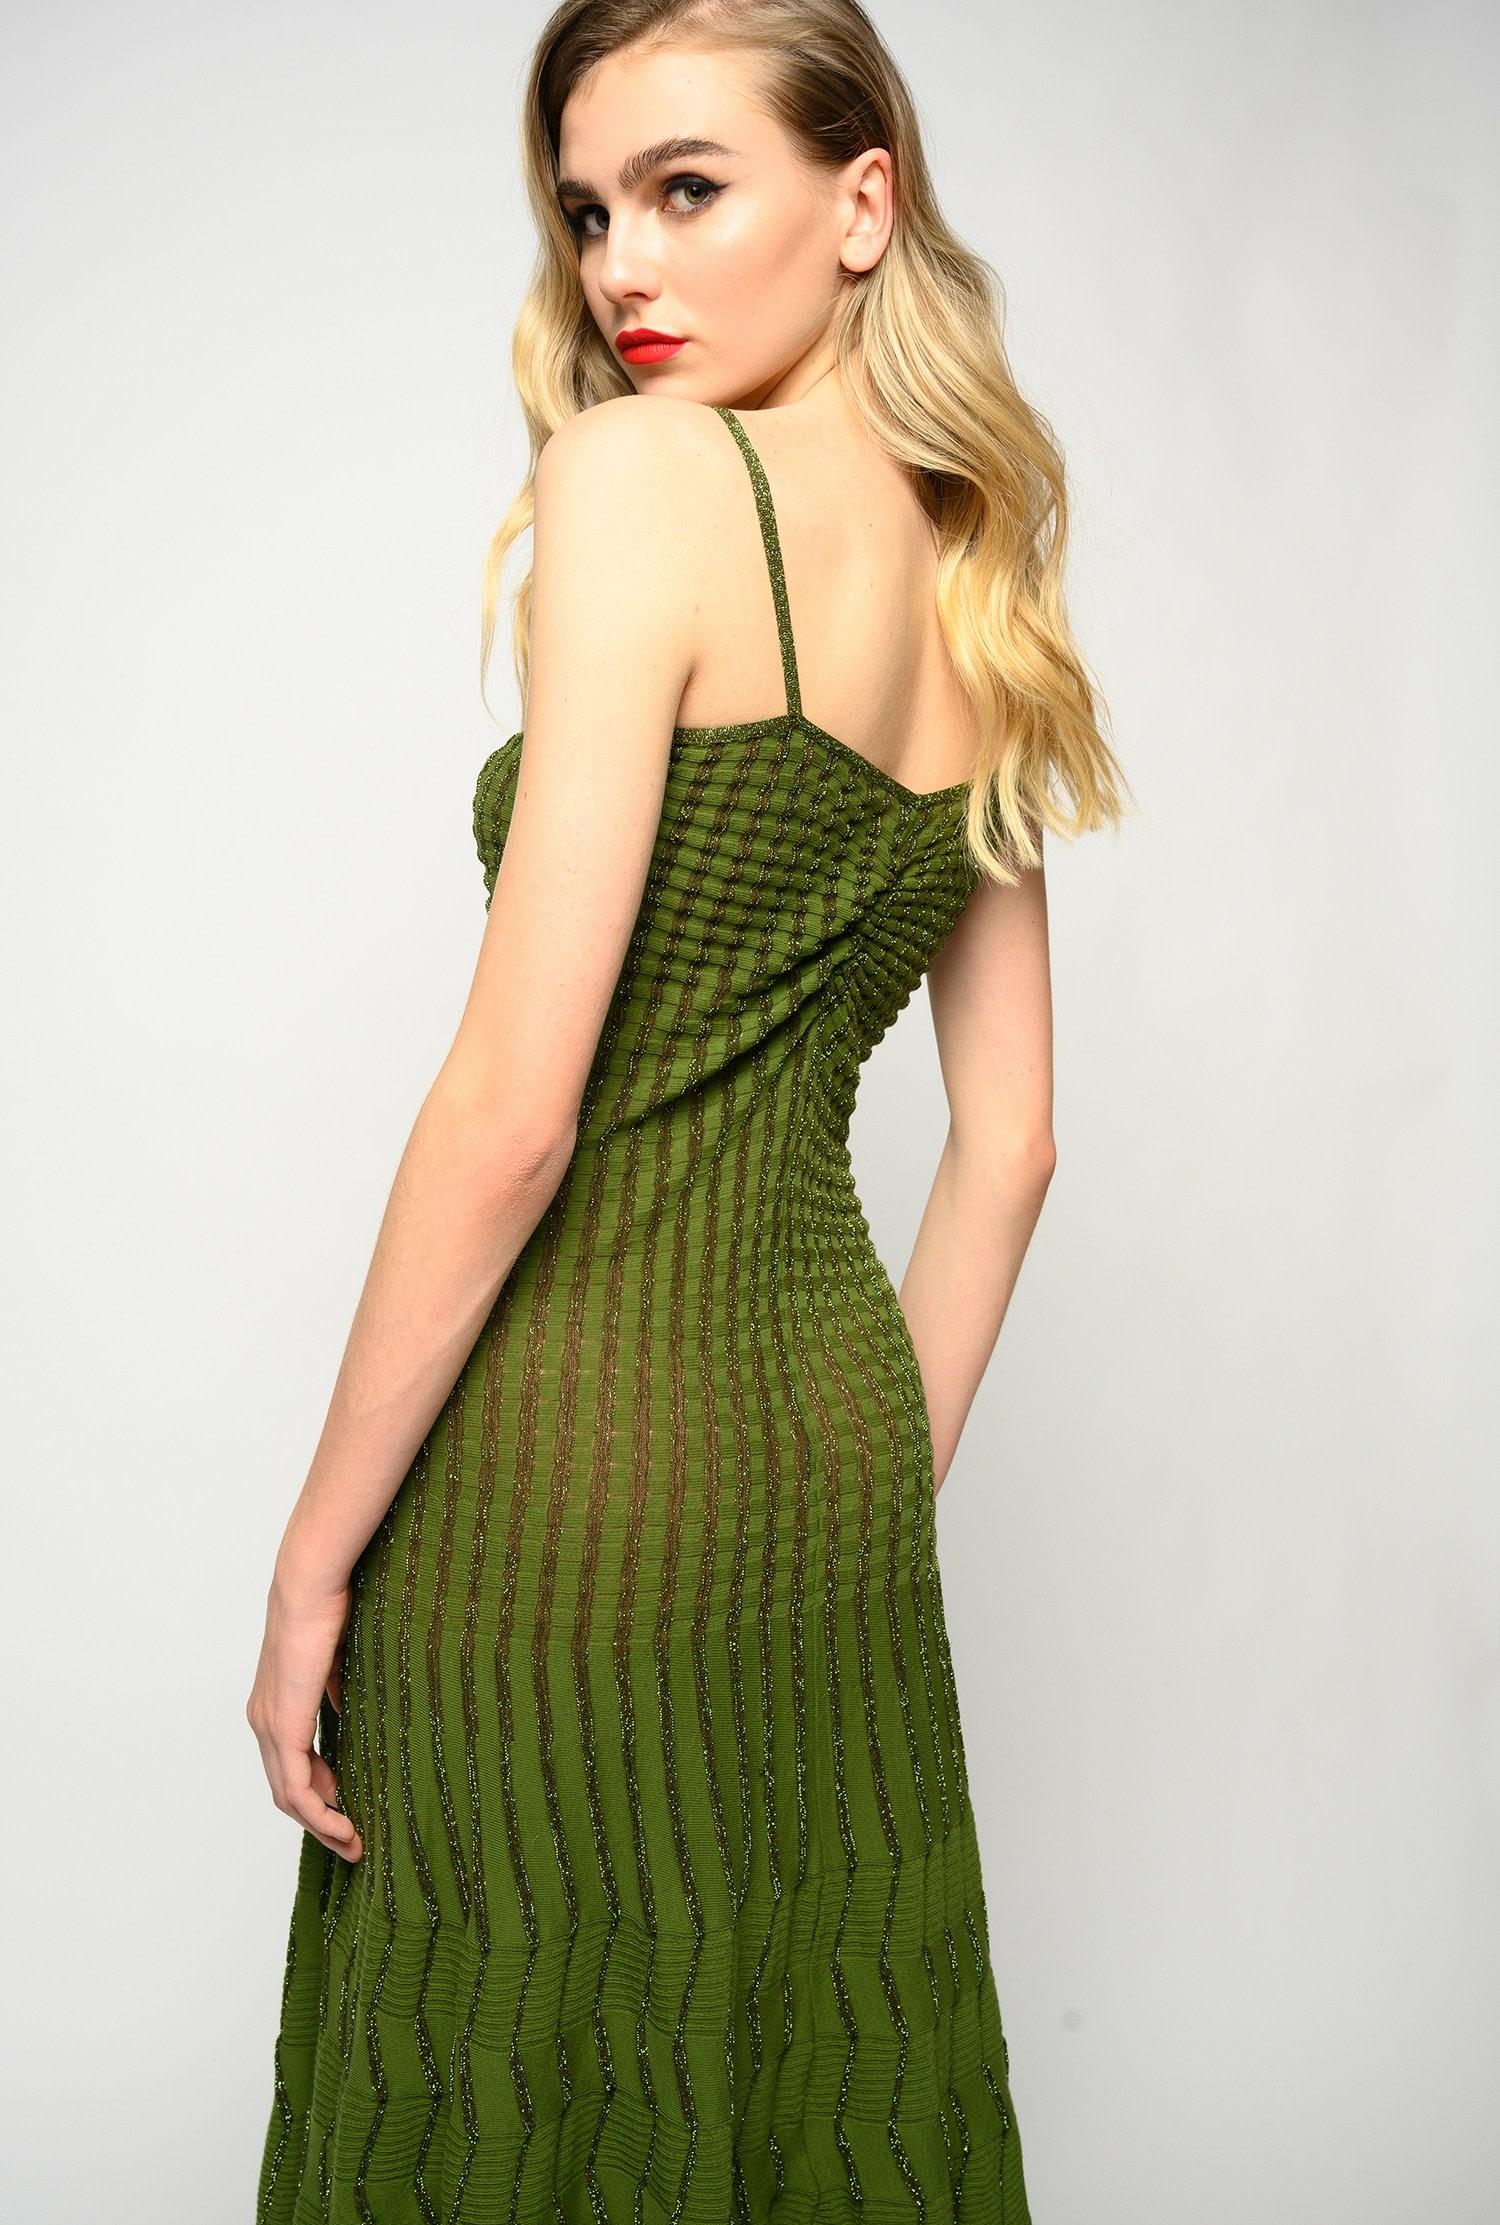 Midi dress in lurex knit with thin straps PINKO |  | 1G15SP-Y6TQXA3